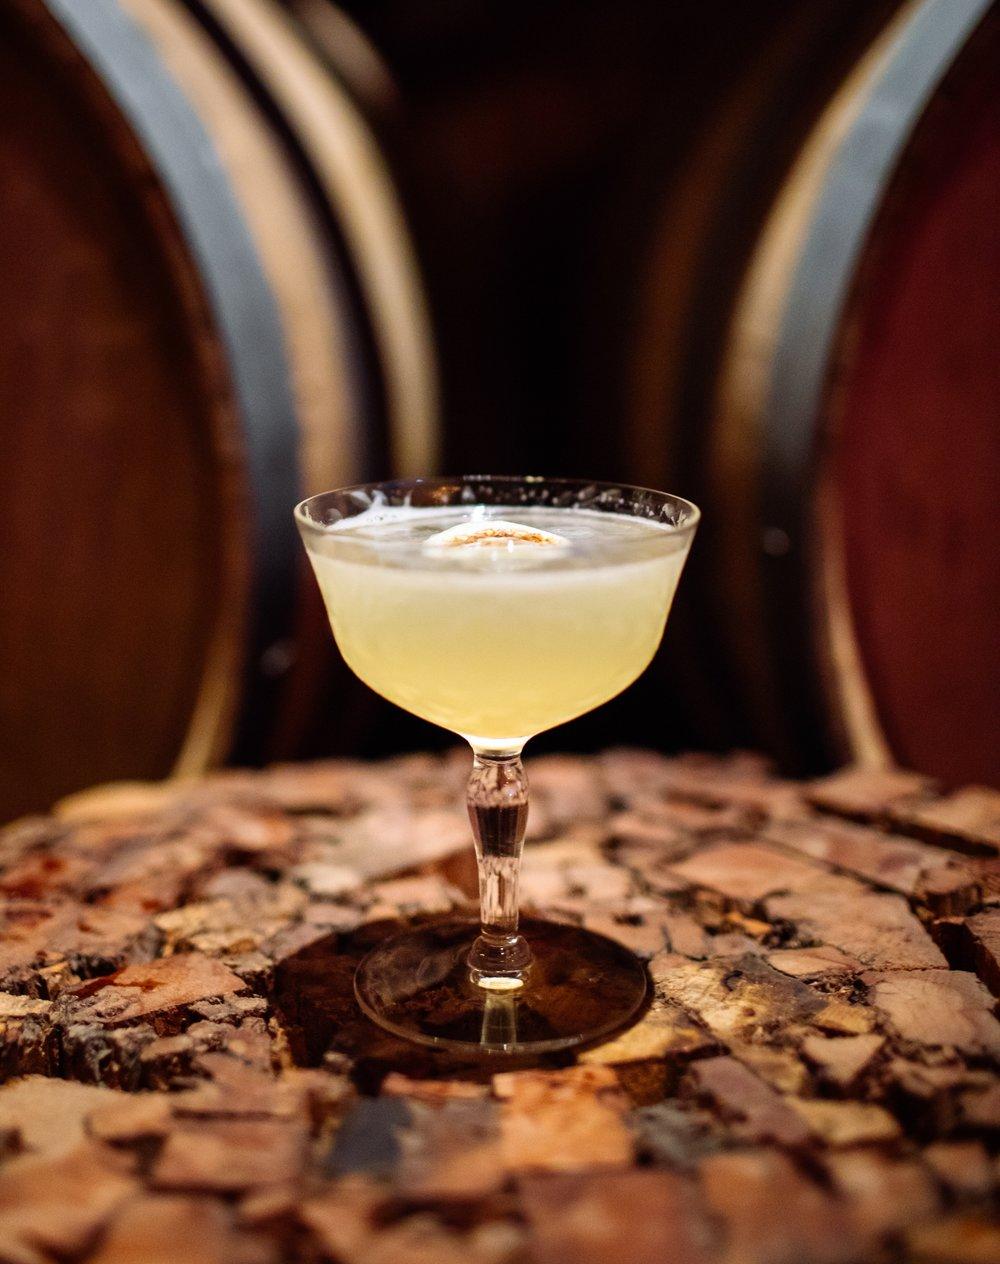 DHARMA BUM - 2 oz white rum (or rhum agricole)1/2 oz nostrum kumquat kaffir lime lemongrass shrub3/4 oz fresh lime juice1/4 oz simple syrupShake with ice and strain.